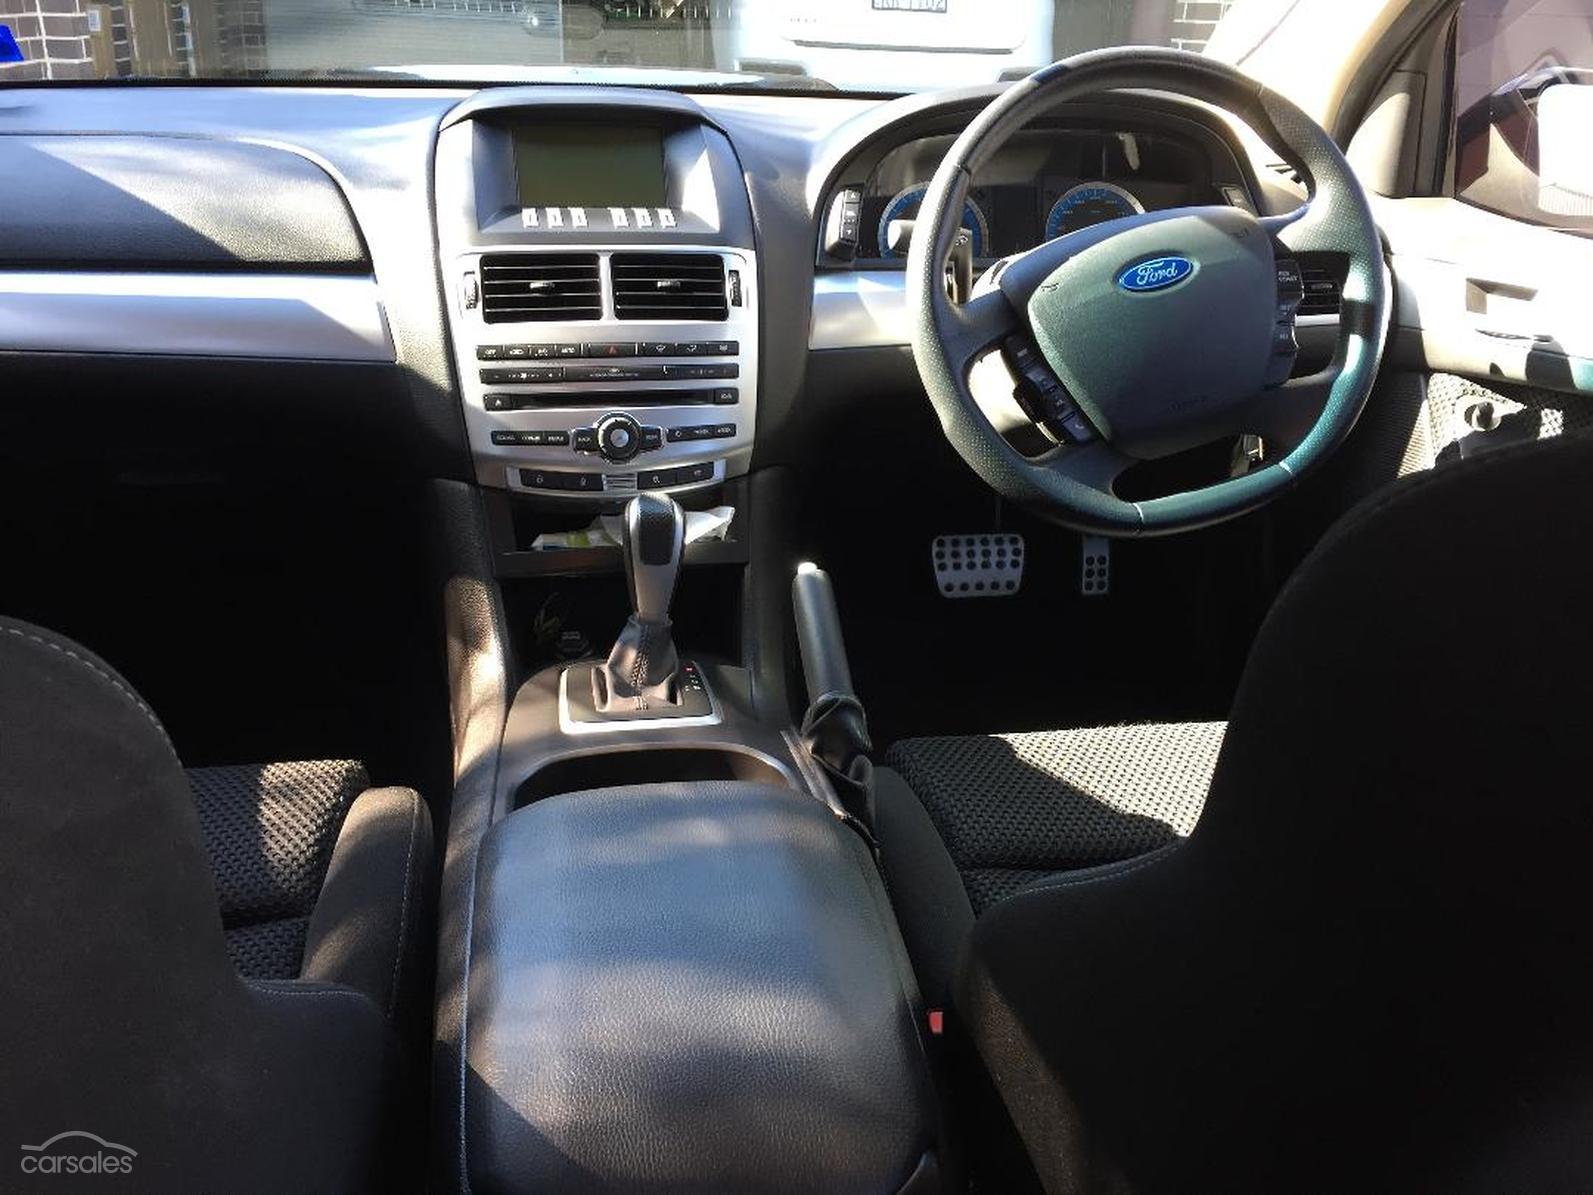 2009 Ford Falcon XR6 Turbo FG Auto-SSE-AD-5438520 - carsales